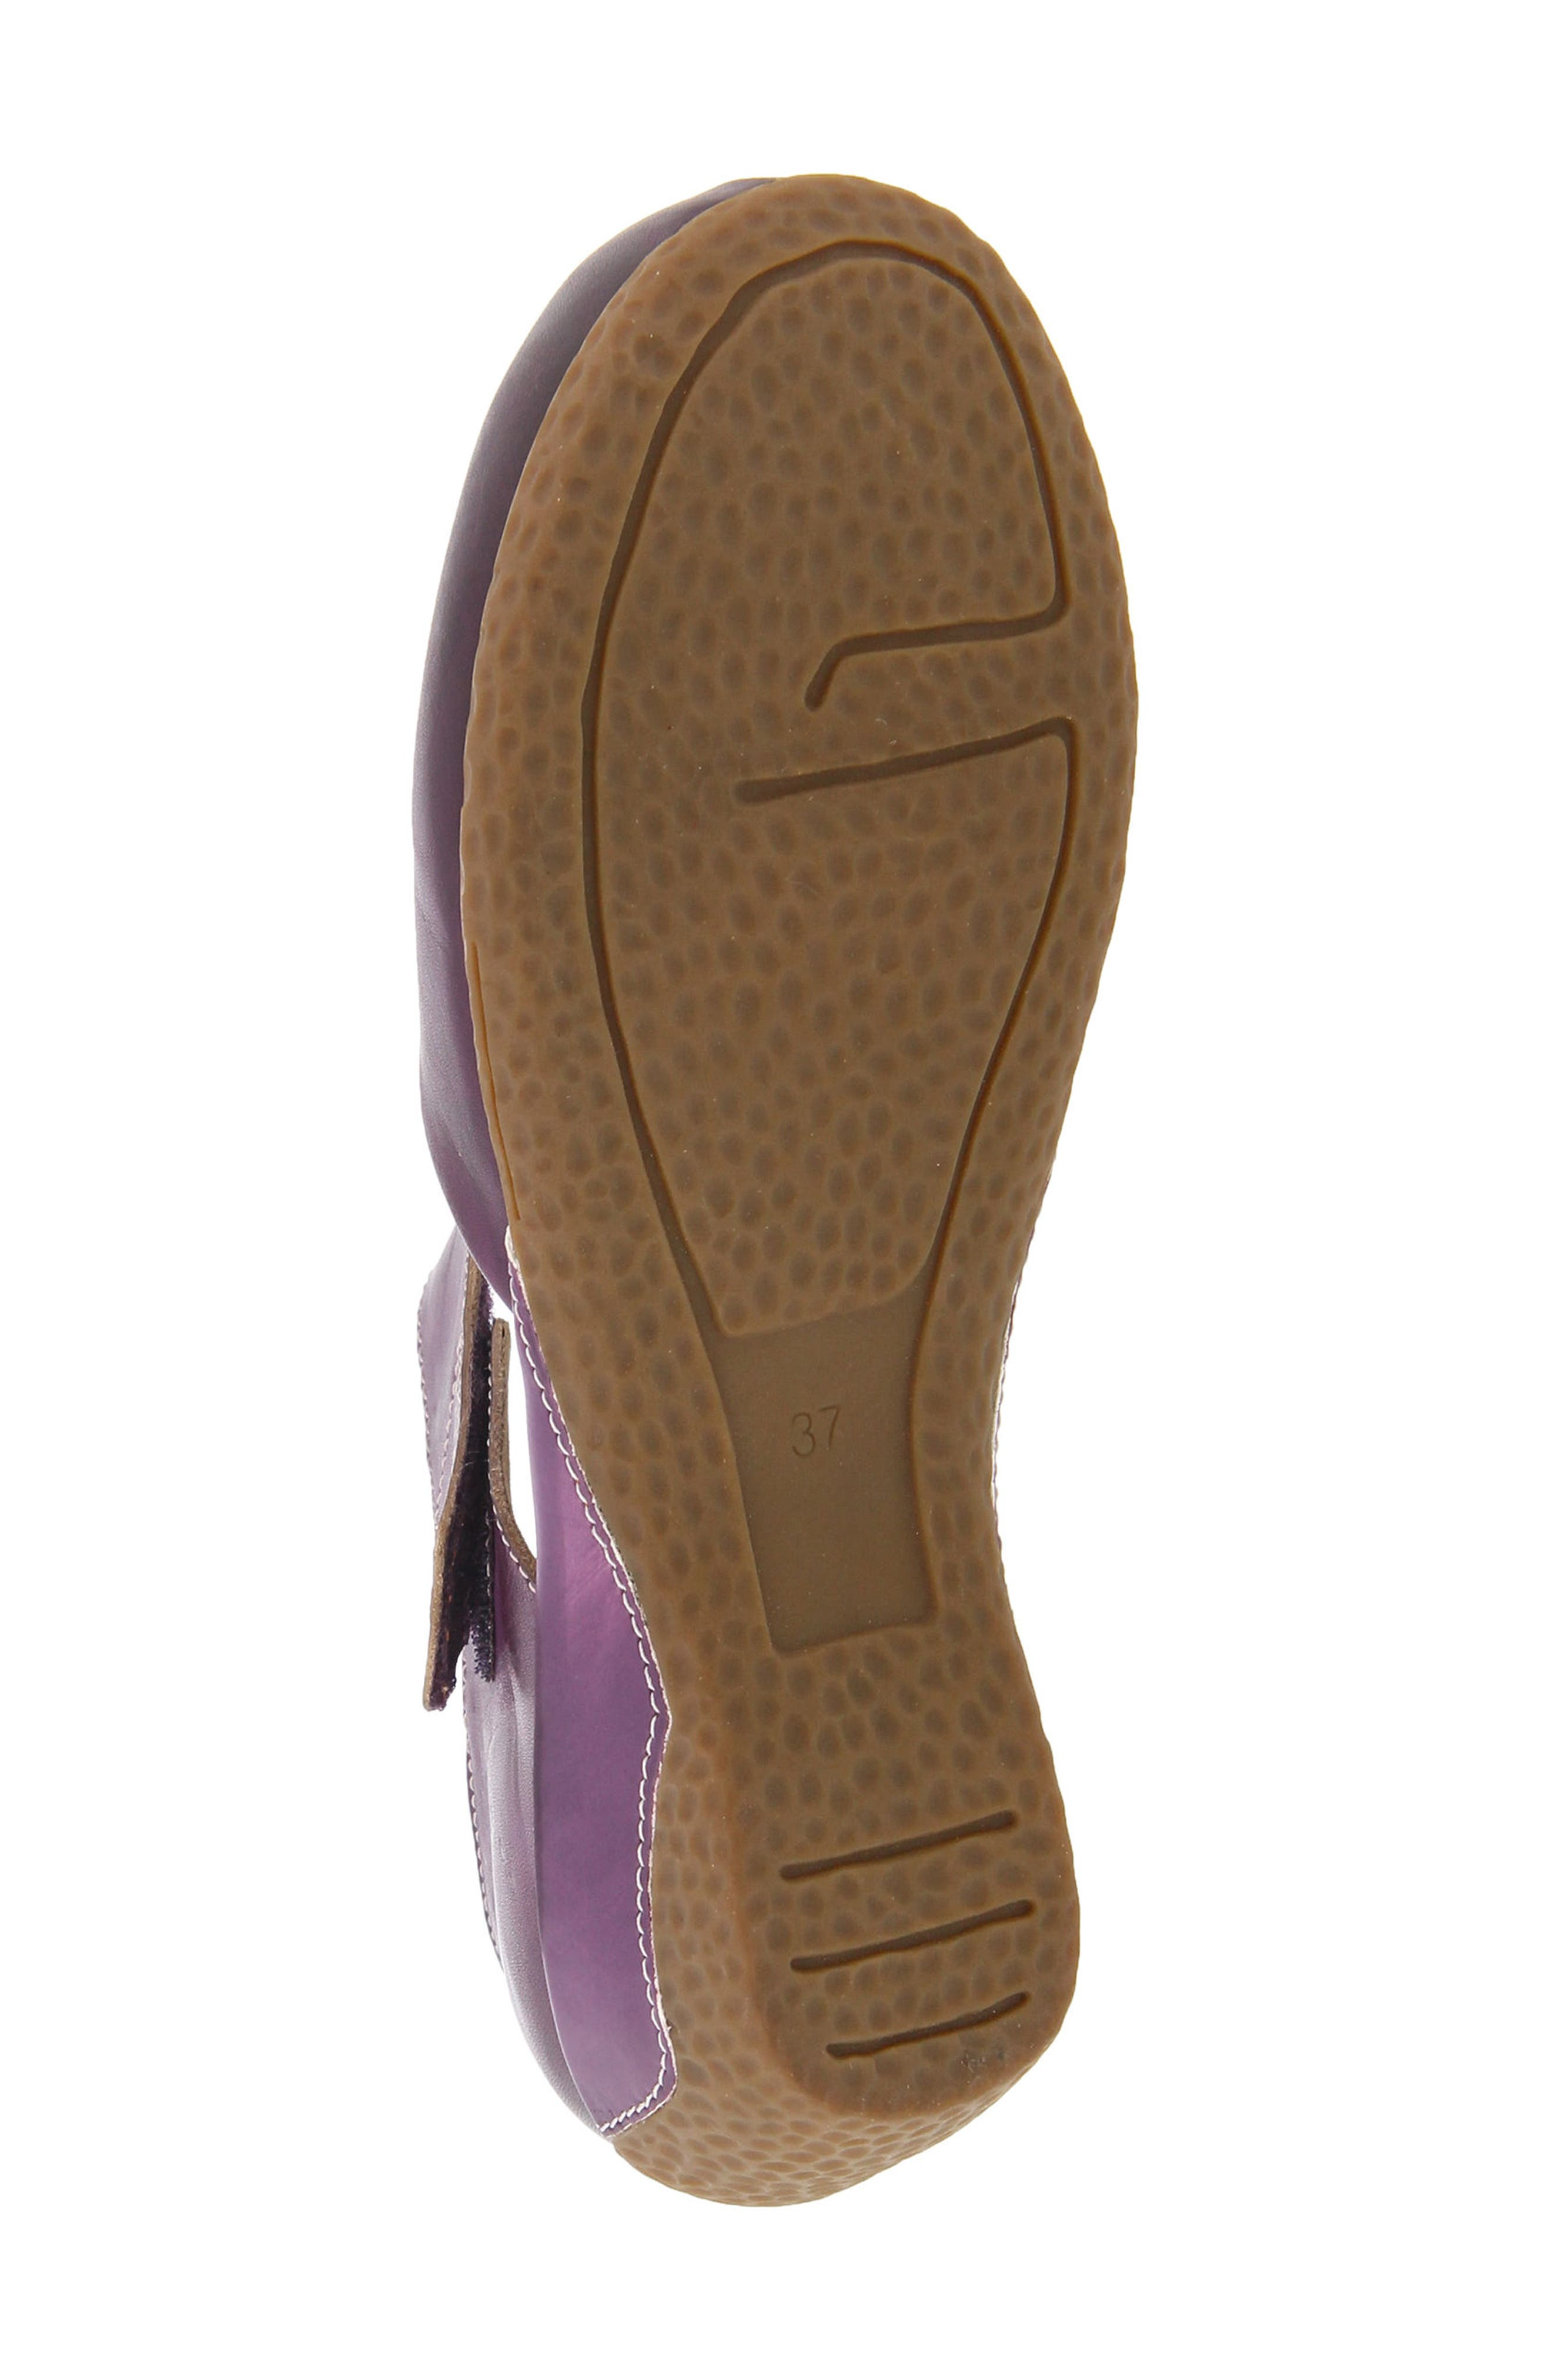 L'Artiste Gloss Mary Jane Pump,                             Alternate thumbnail 5, color,                             Purple Leather